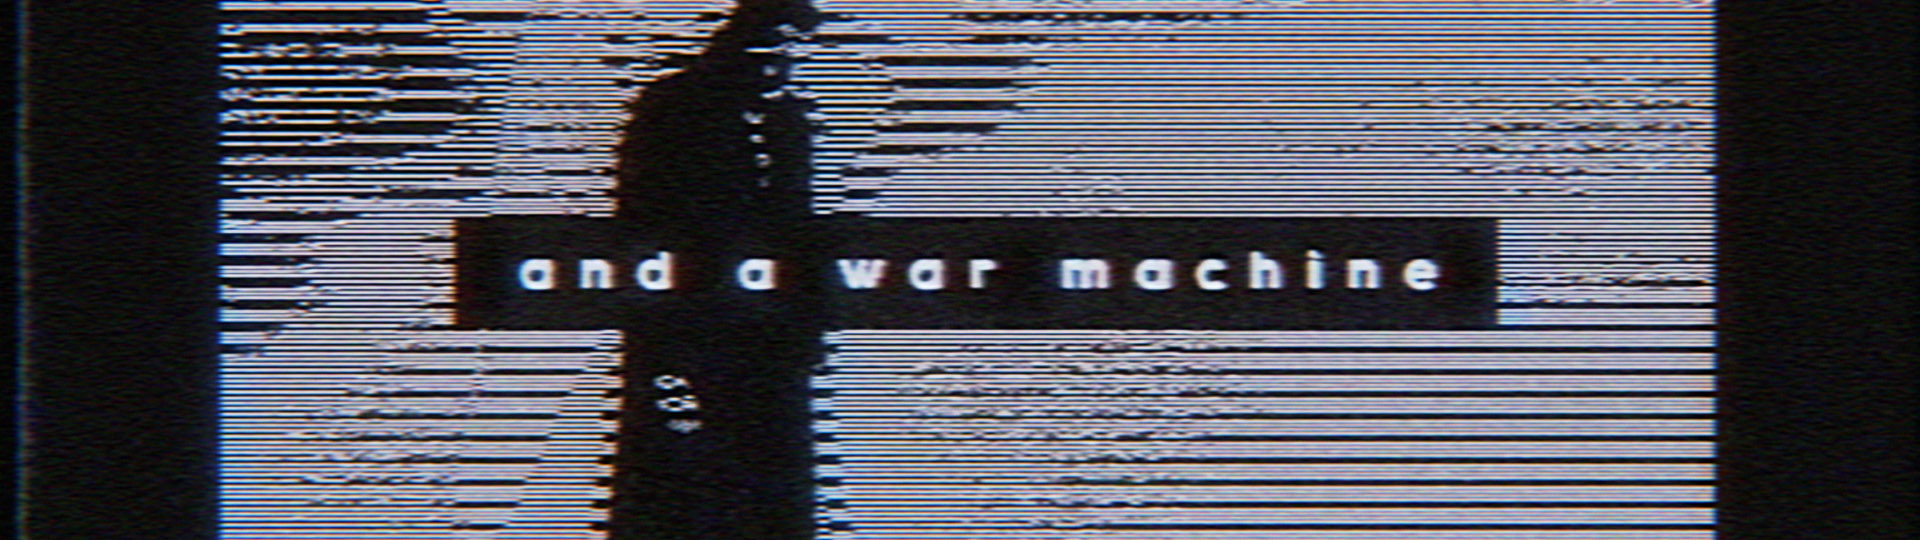 MGLP#001_WarMachine